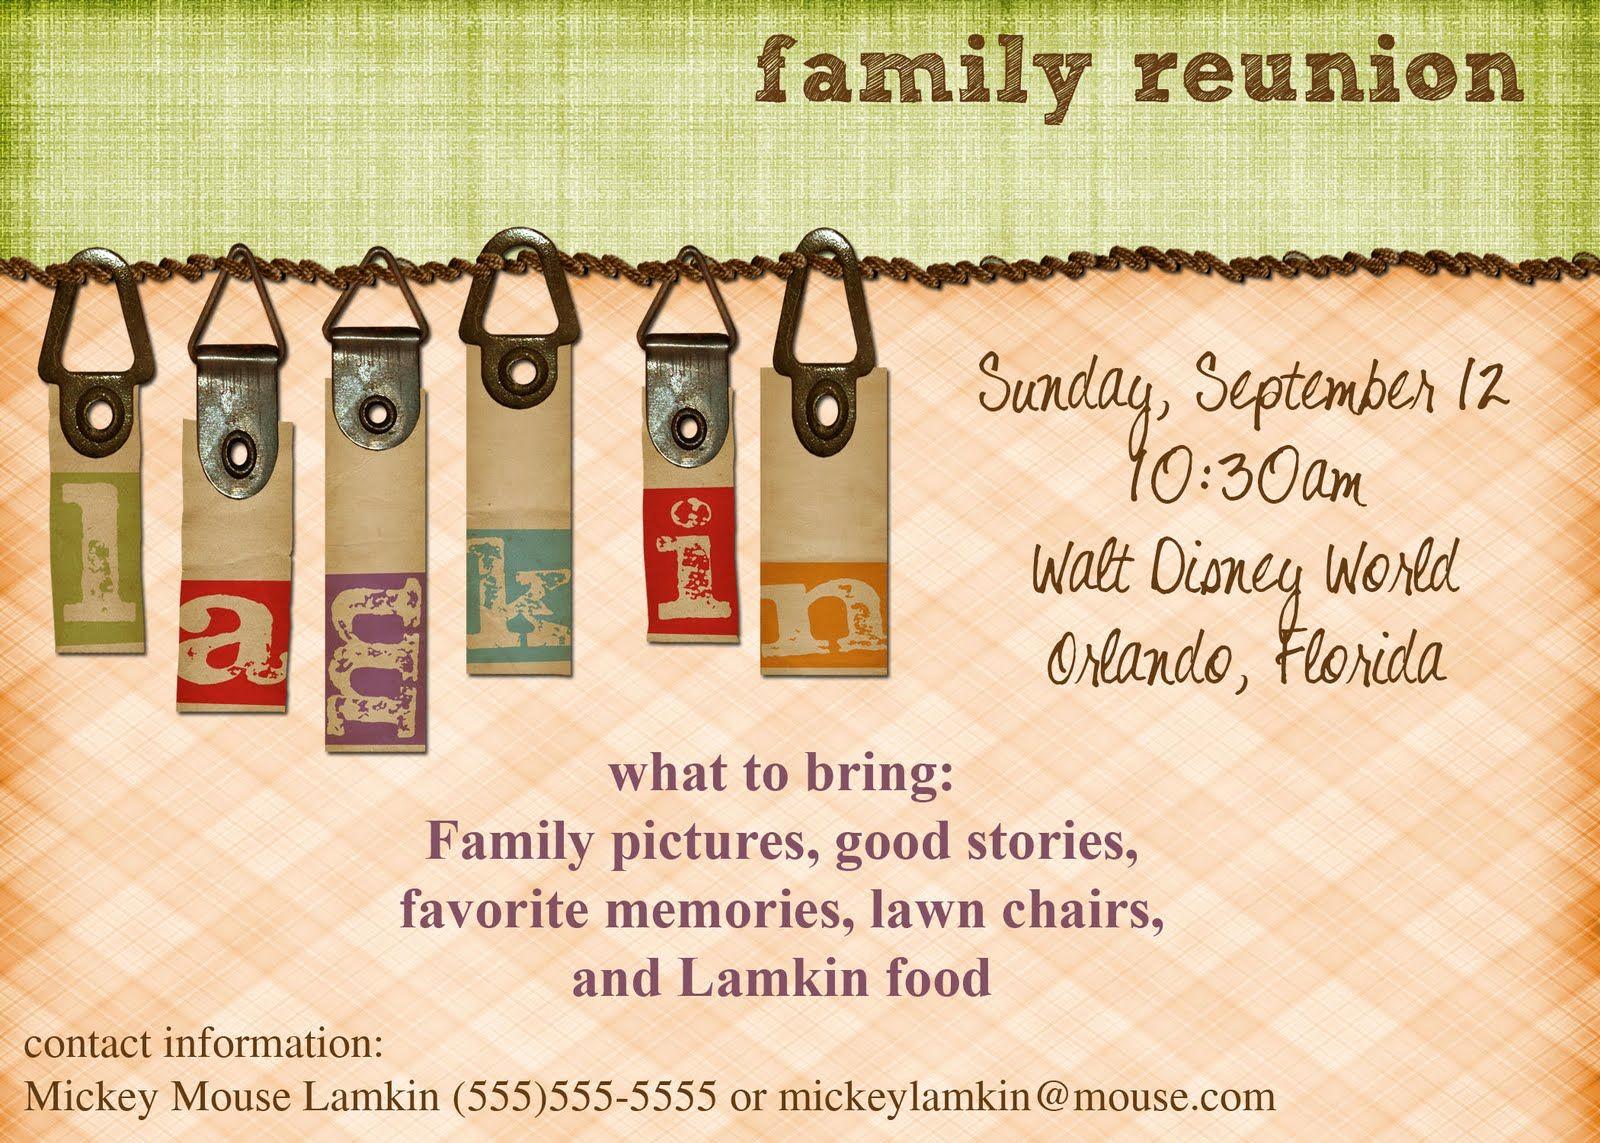 Family Reunion Invitation Templates Inspirational Viewing Gallery for Family Reunion Invitations